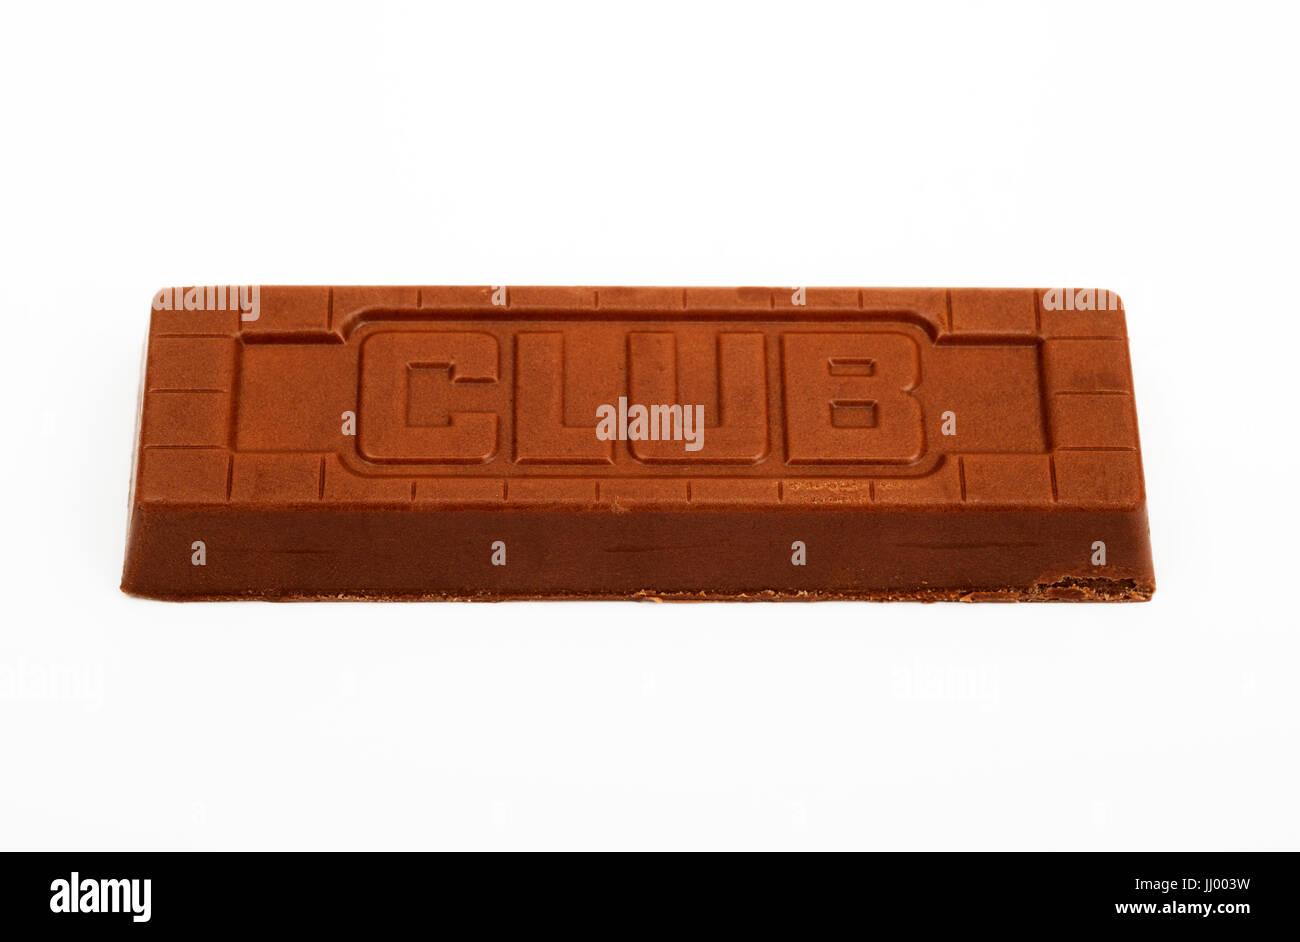 Club Orange Chocolate Biscuit Stock Photo 148746861 Alamy